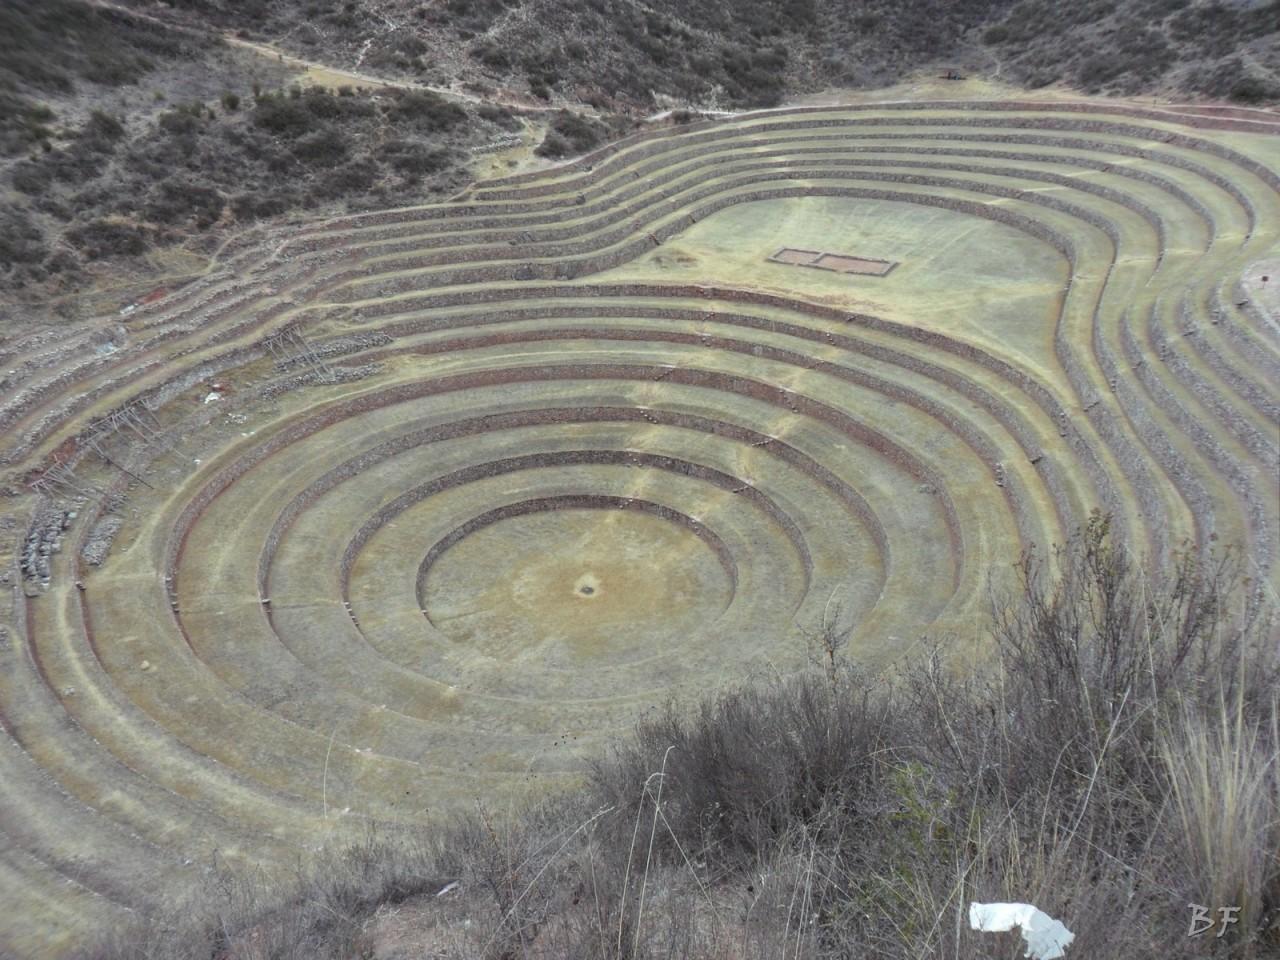 Terrazze-Circolari-Megaliti-Moray-Saline-Maras-Cusco-Perù-19